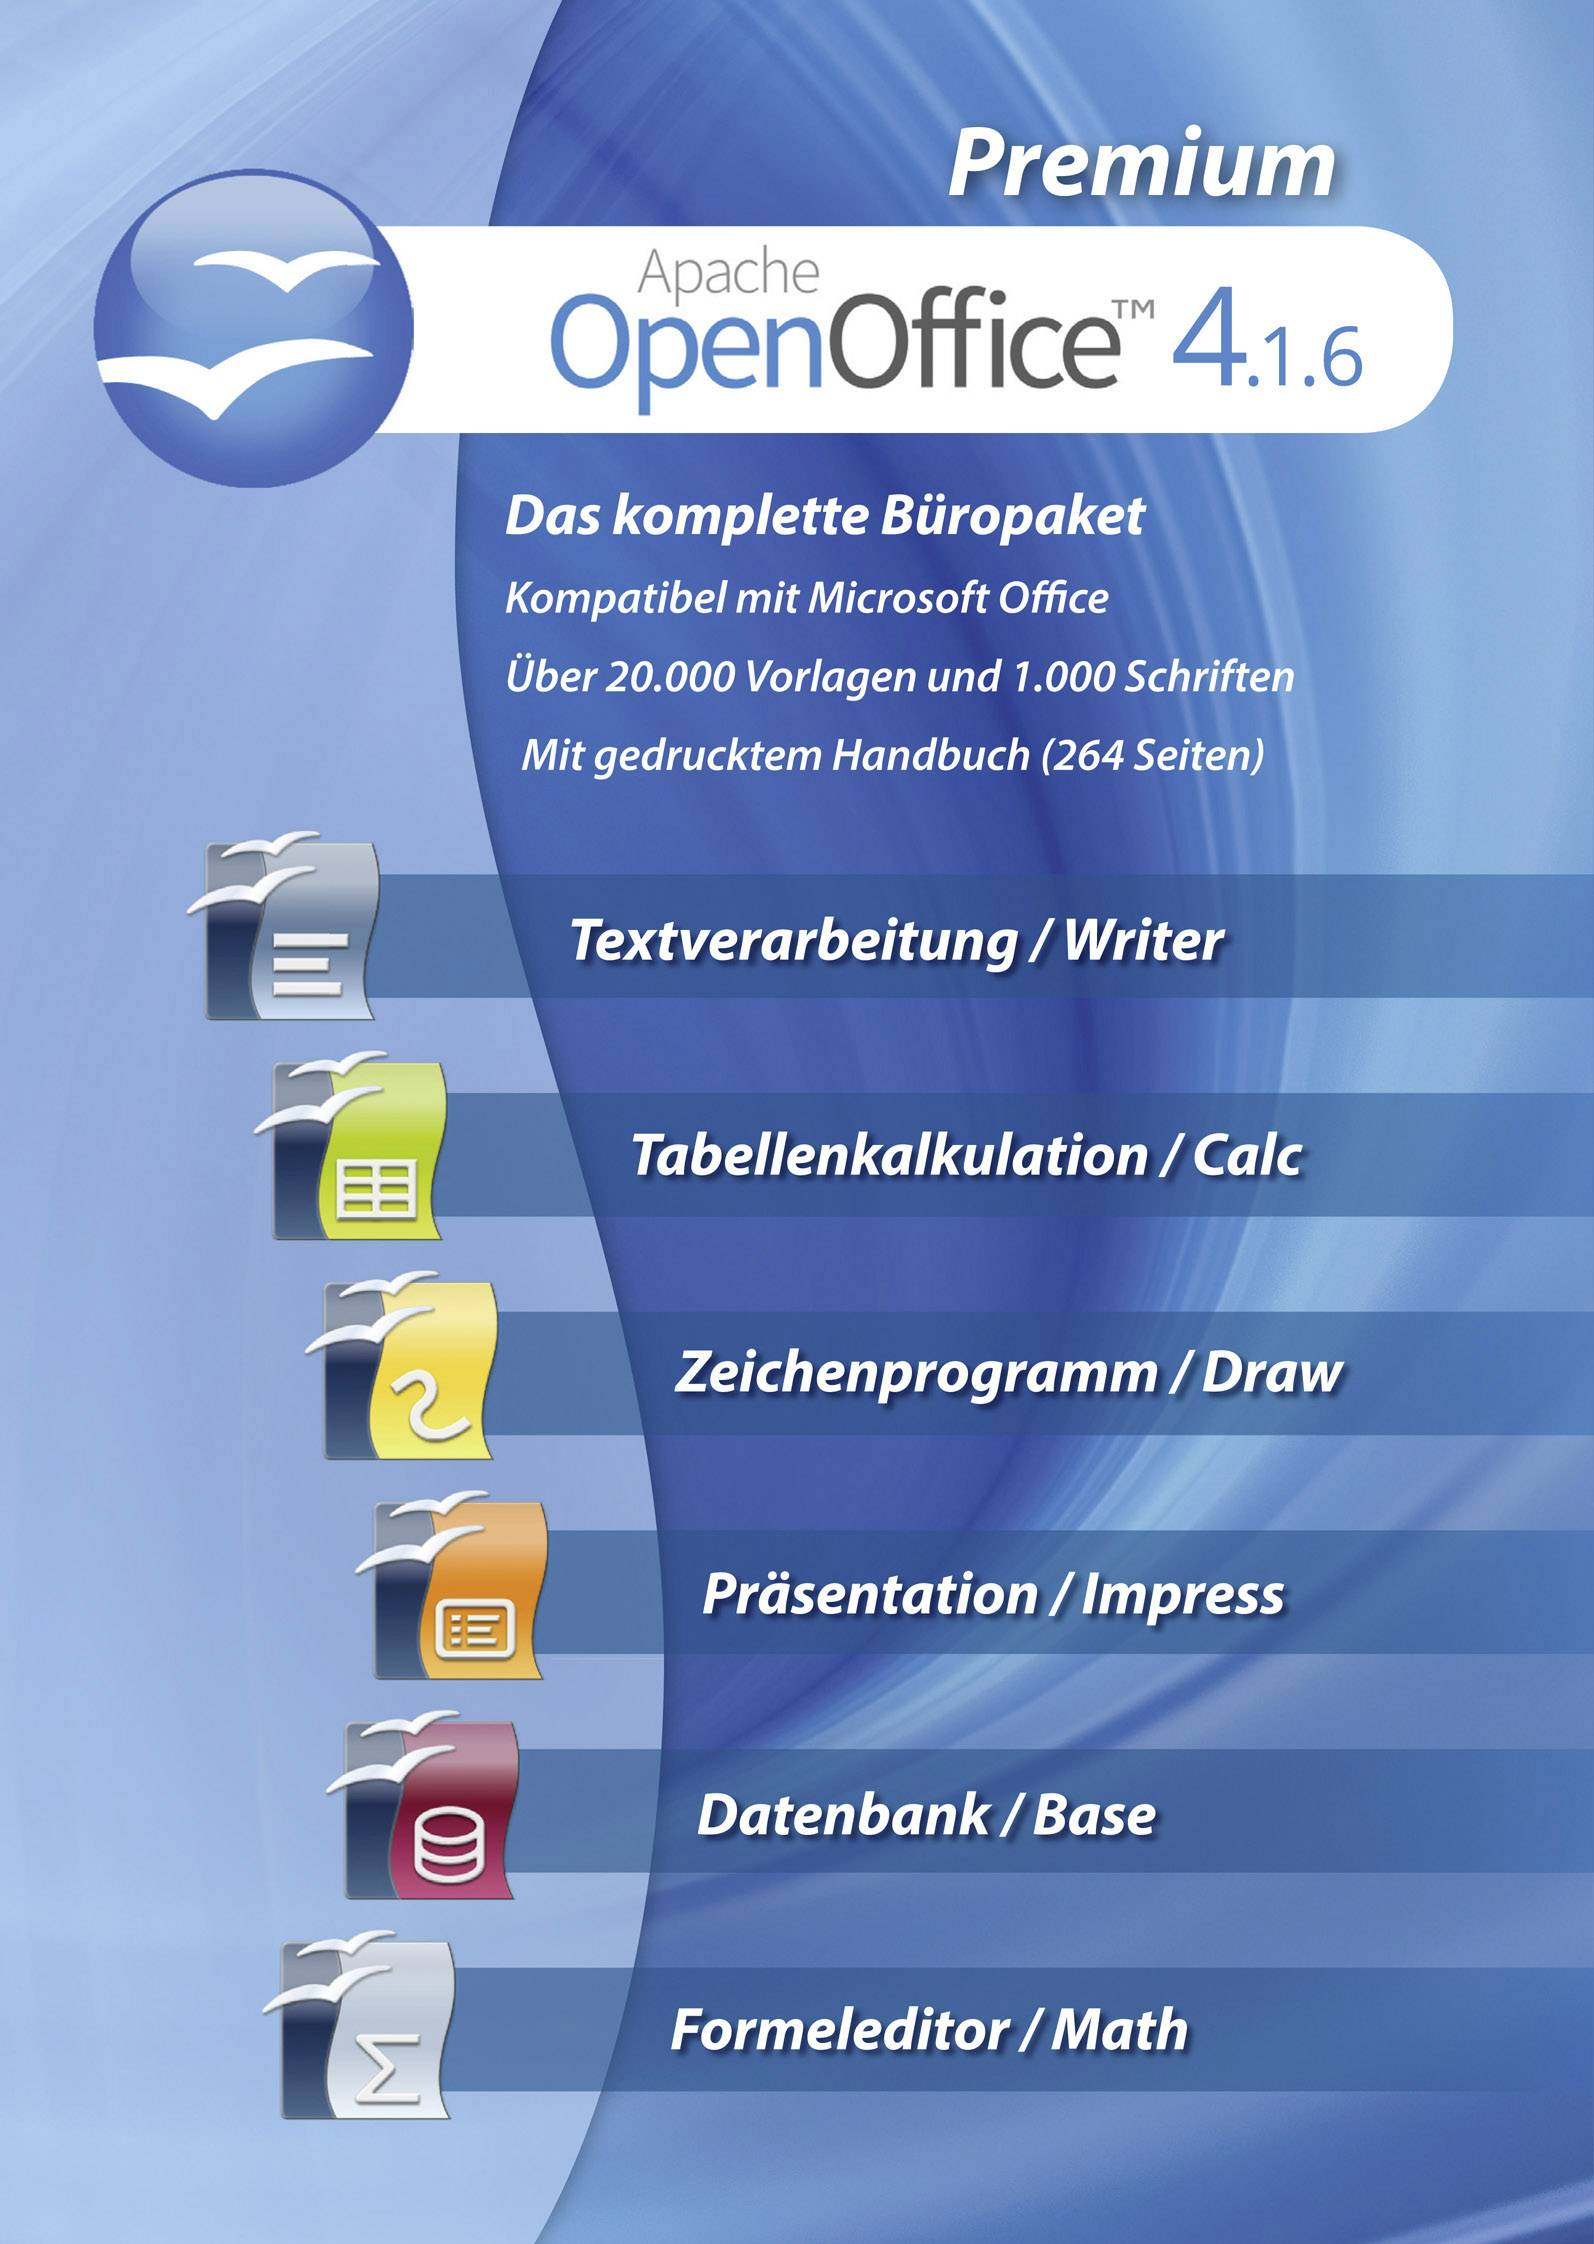 Openoffice 416 Premium Windows Office Paket